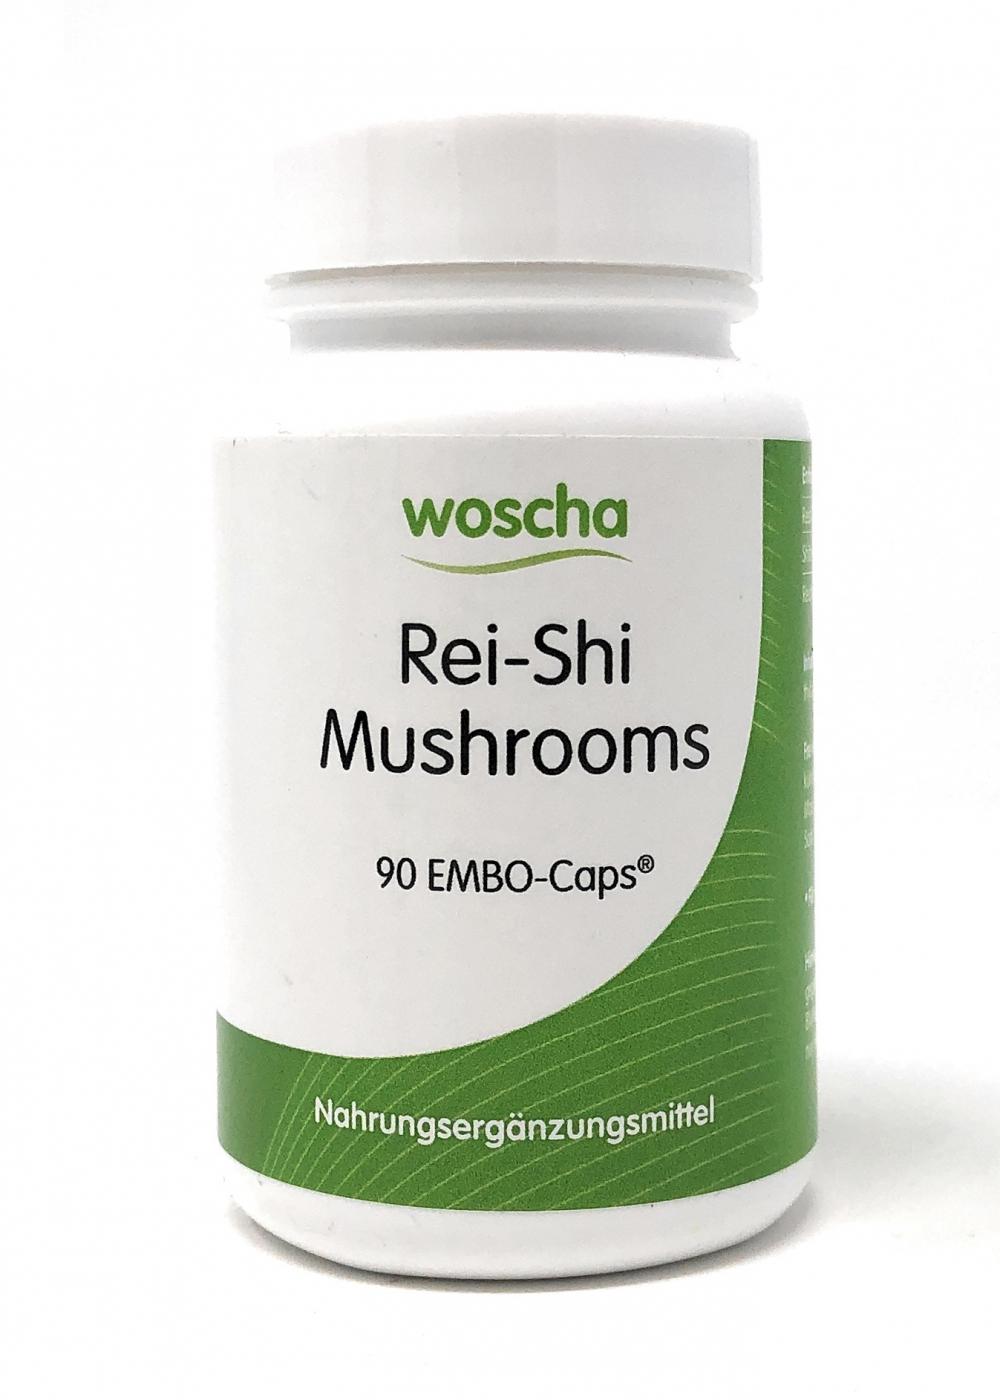 woscha Rei-Shi Mushrooms 90 Embo-Caps (31g) (vegan)